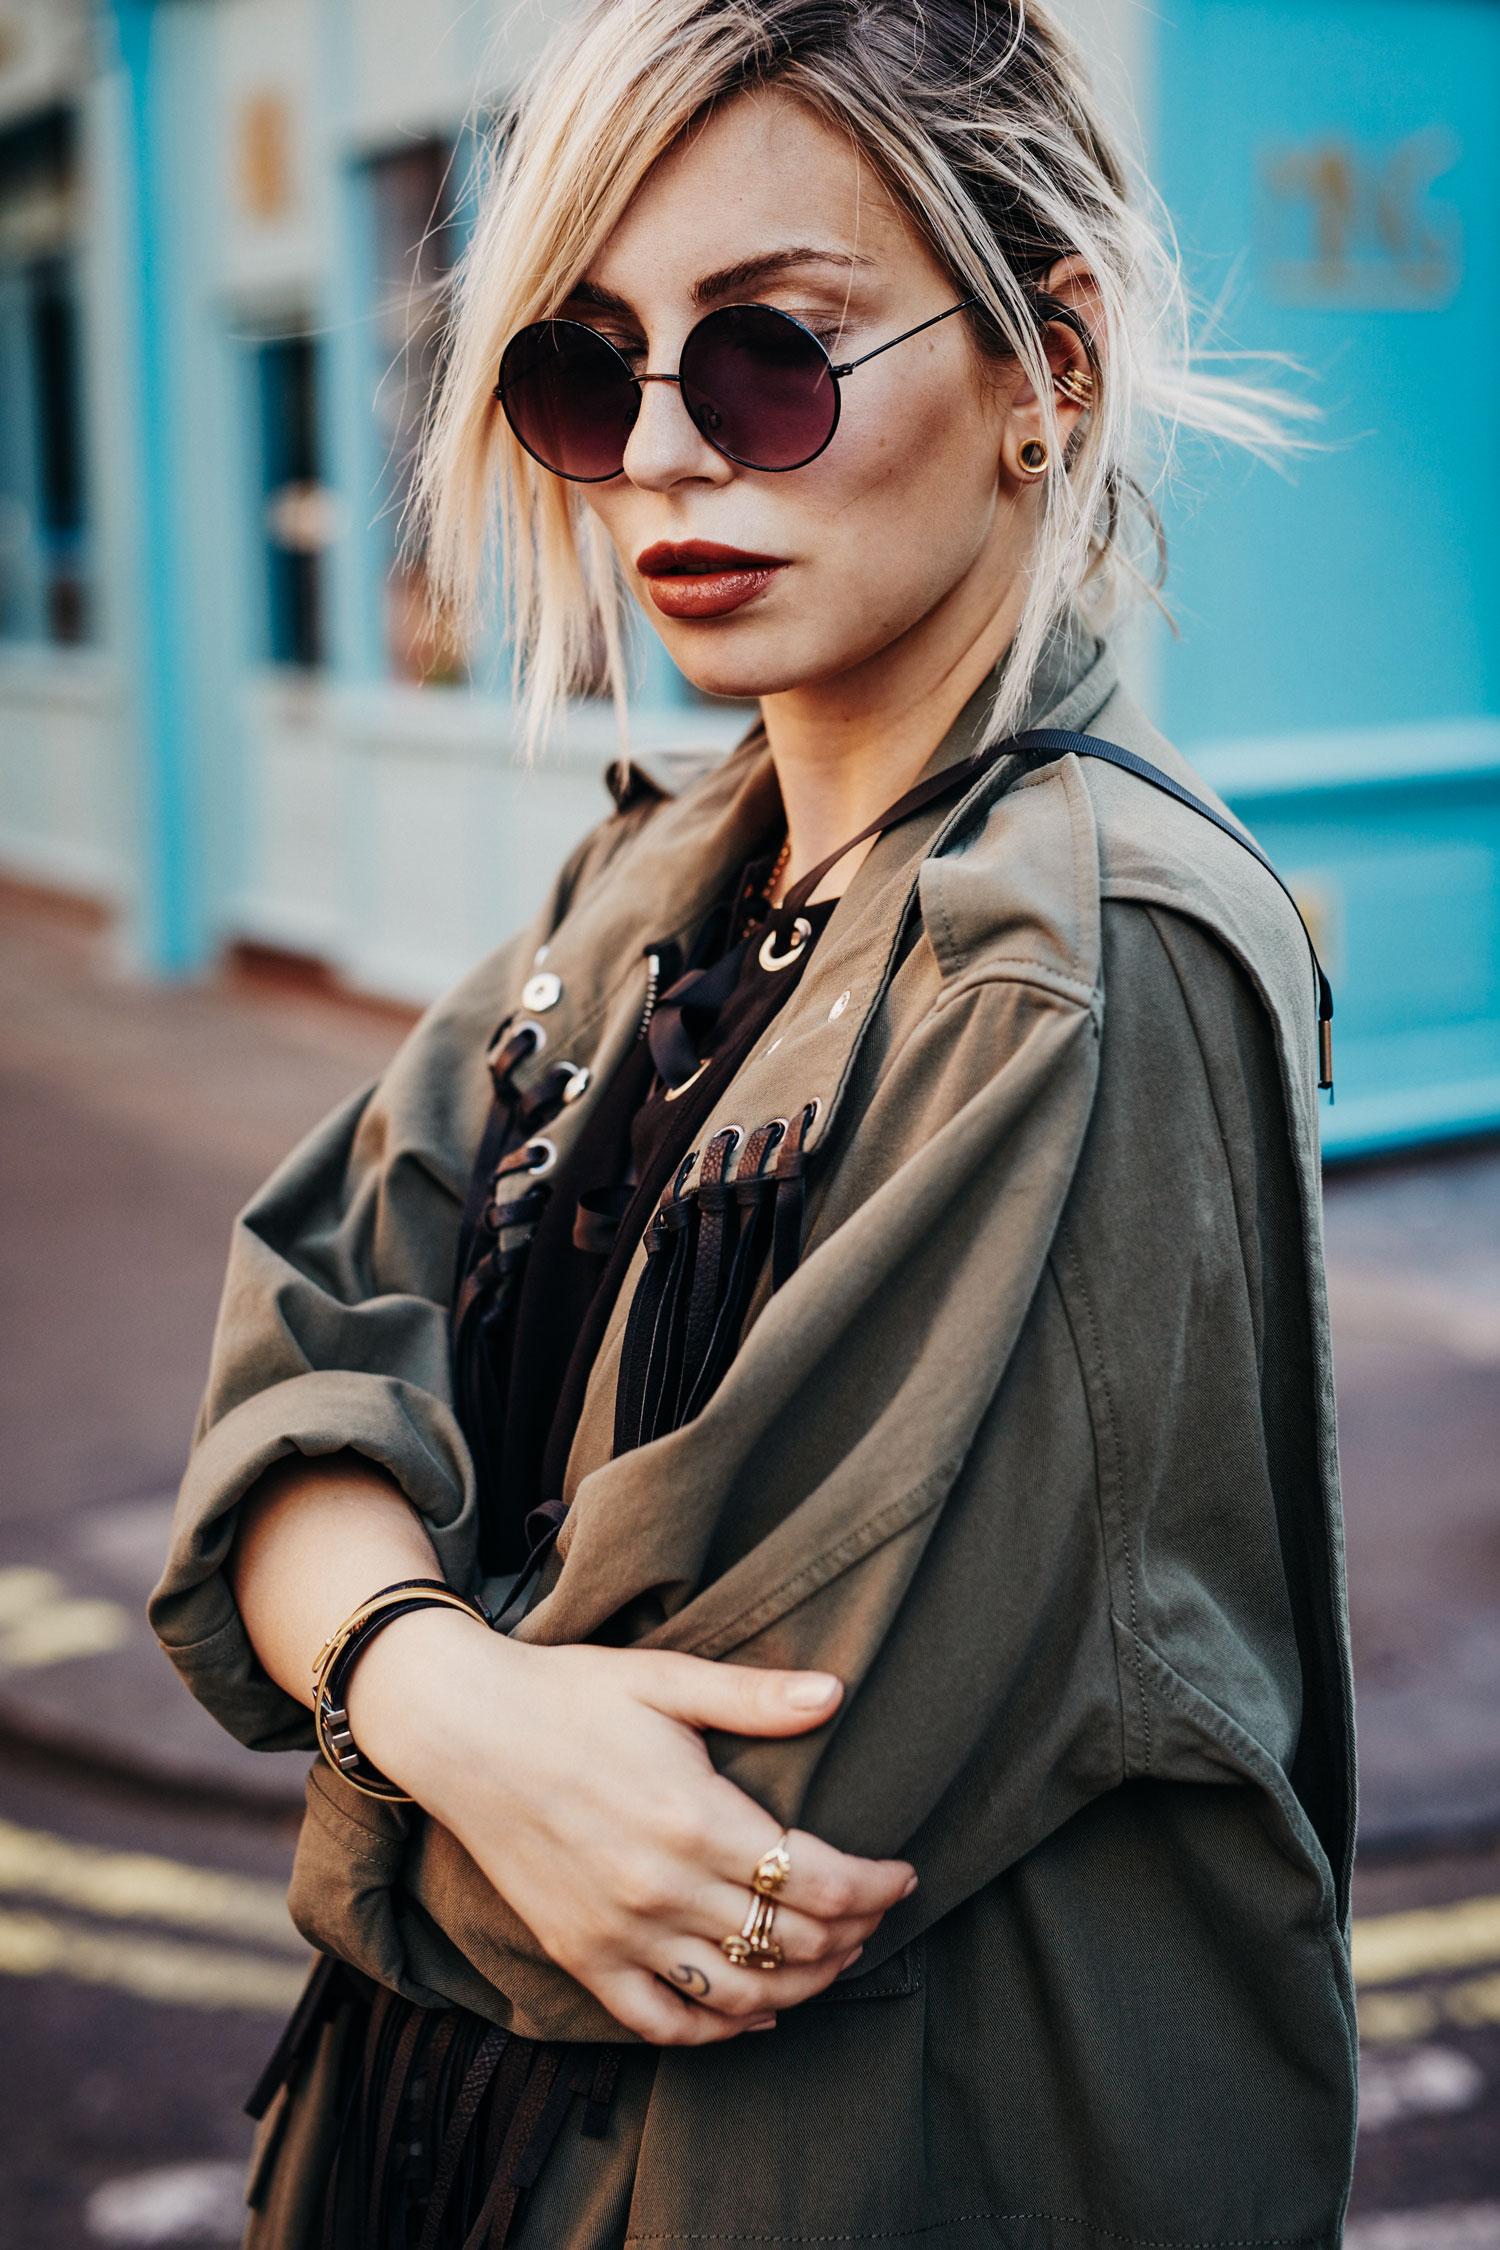 Куртка с бахромой | местоположение: Лондон| бренды: куртка на меху от Alexander Wang, туфли с бахромой от Jimmy Choo, маленькая сумка от Sonia Rykiel | стиль: 70-е, бохо, острый, хиппи